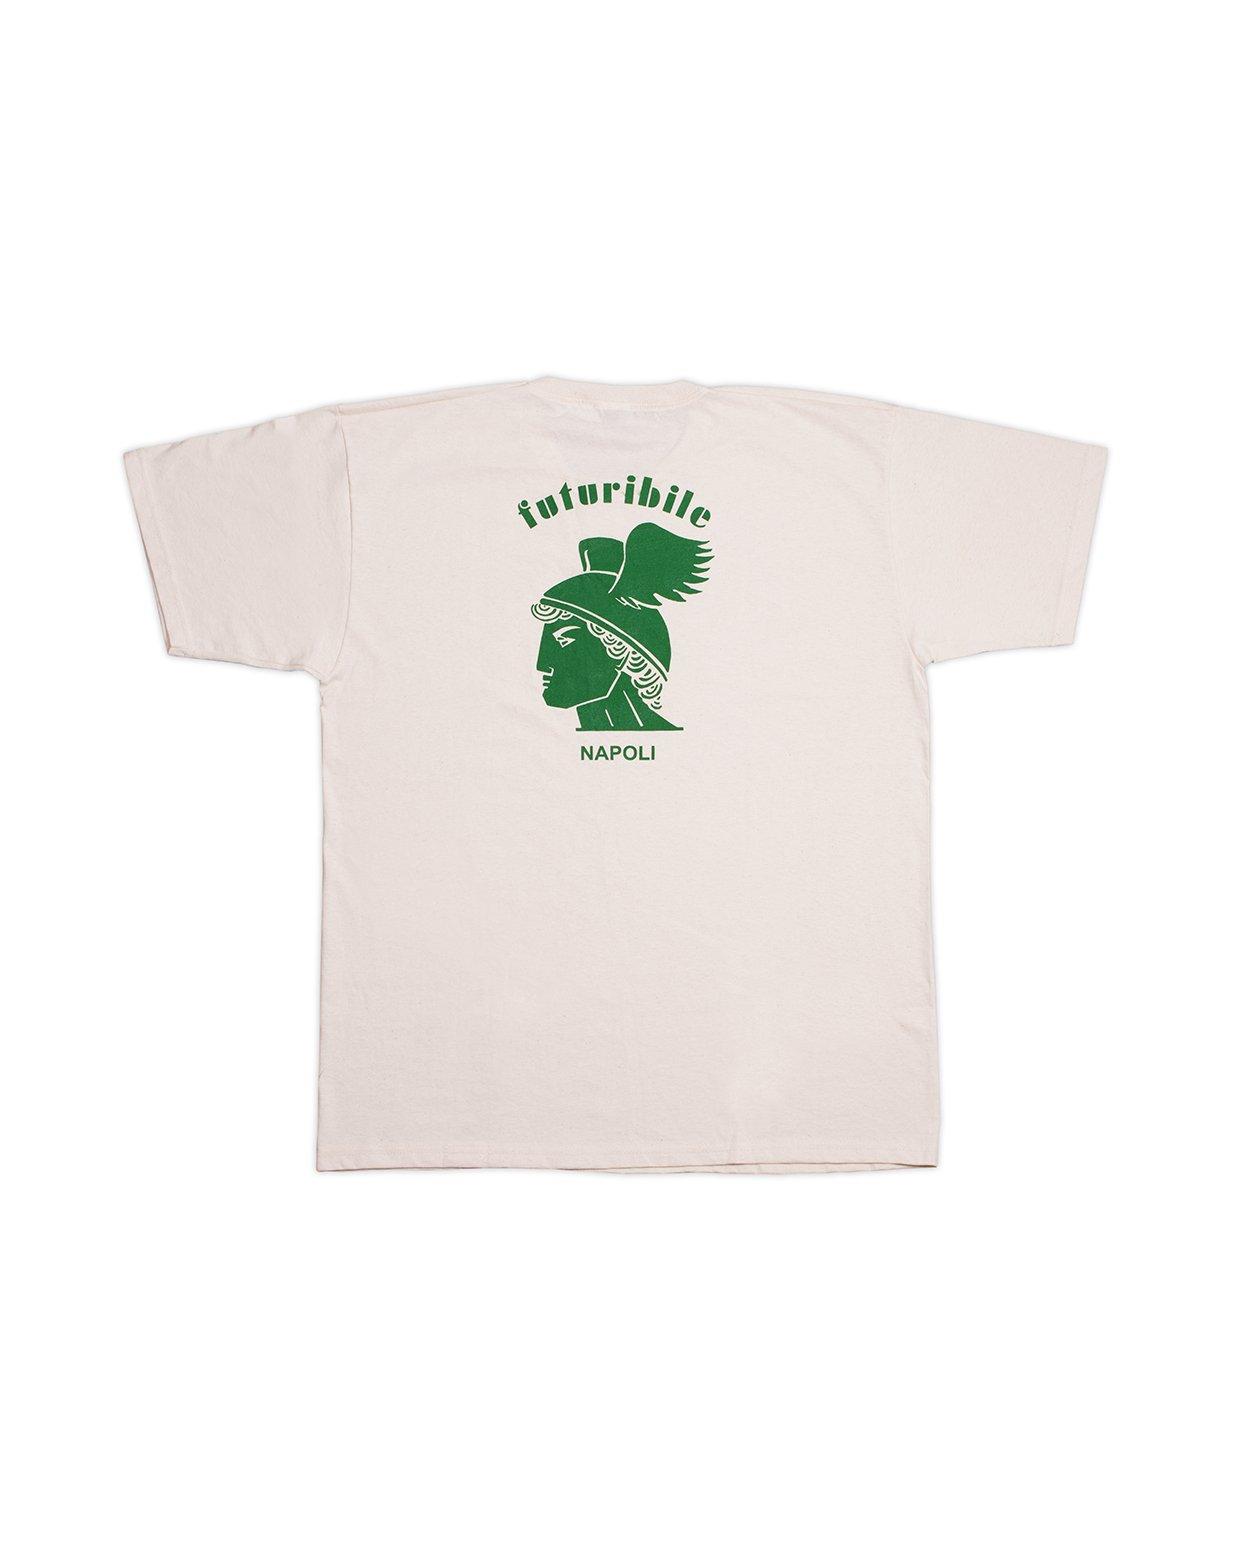 "Image of T-Shirt ""Futuribile Napoli"" (Green)"